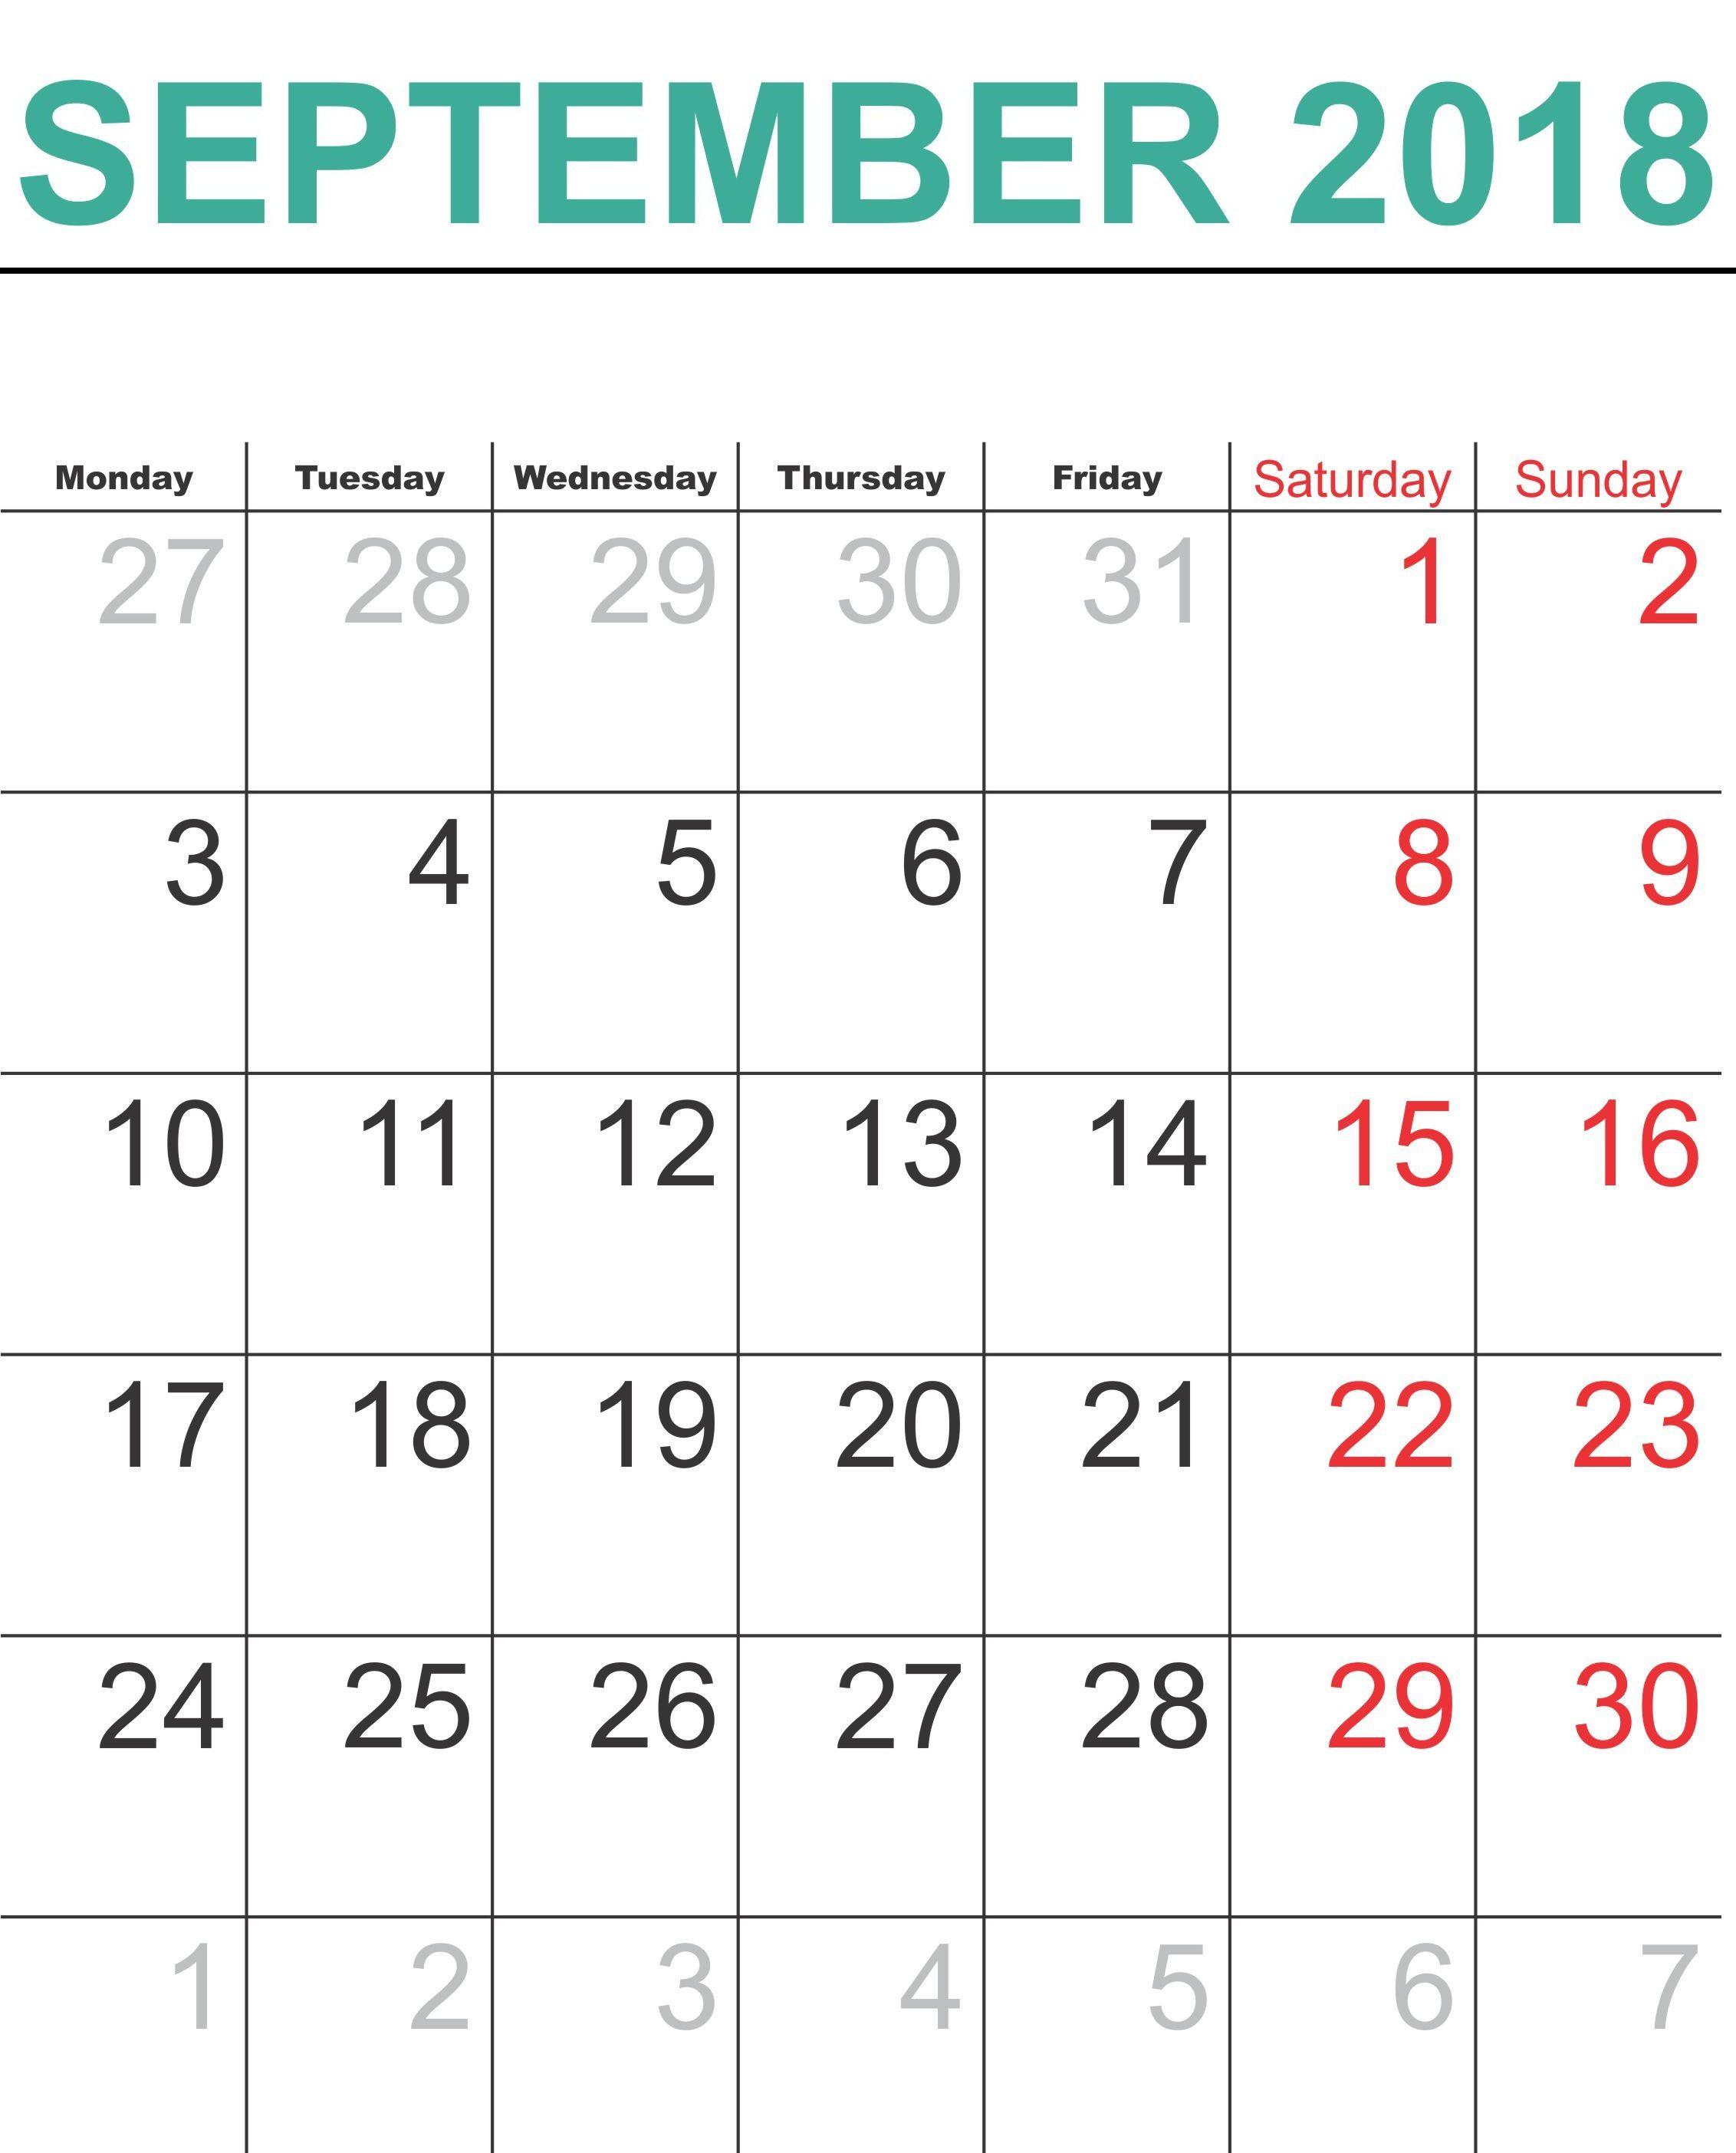 calendar september 2018 template free download universe